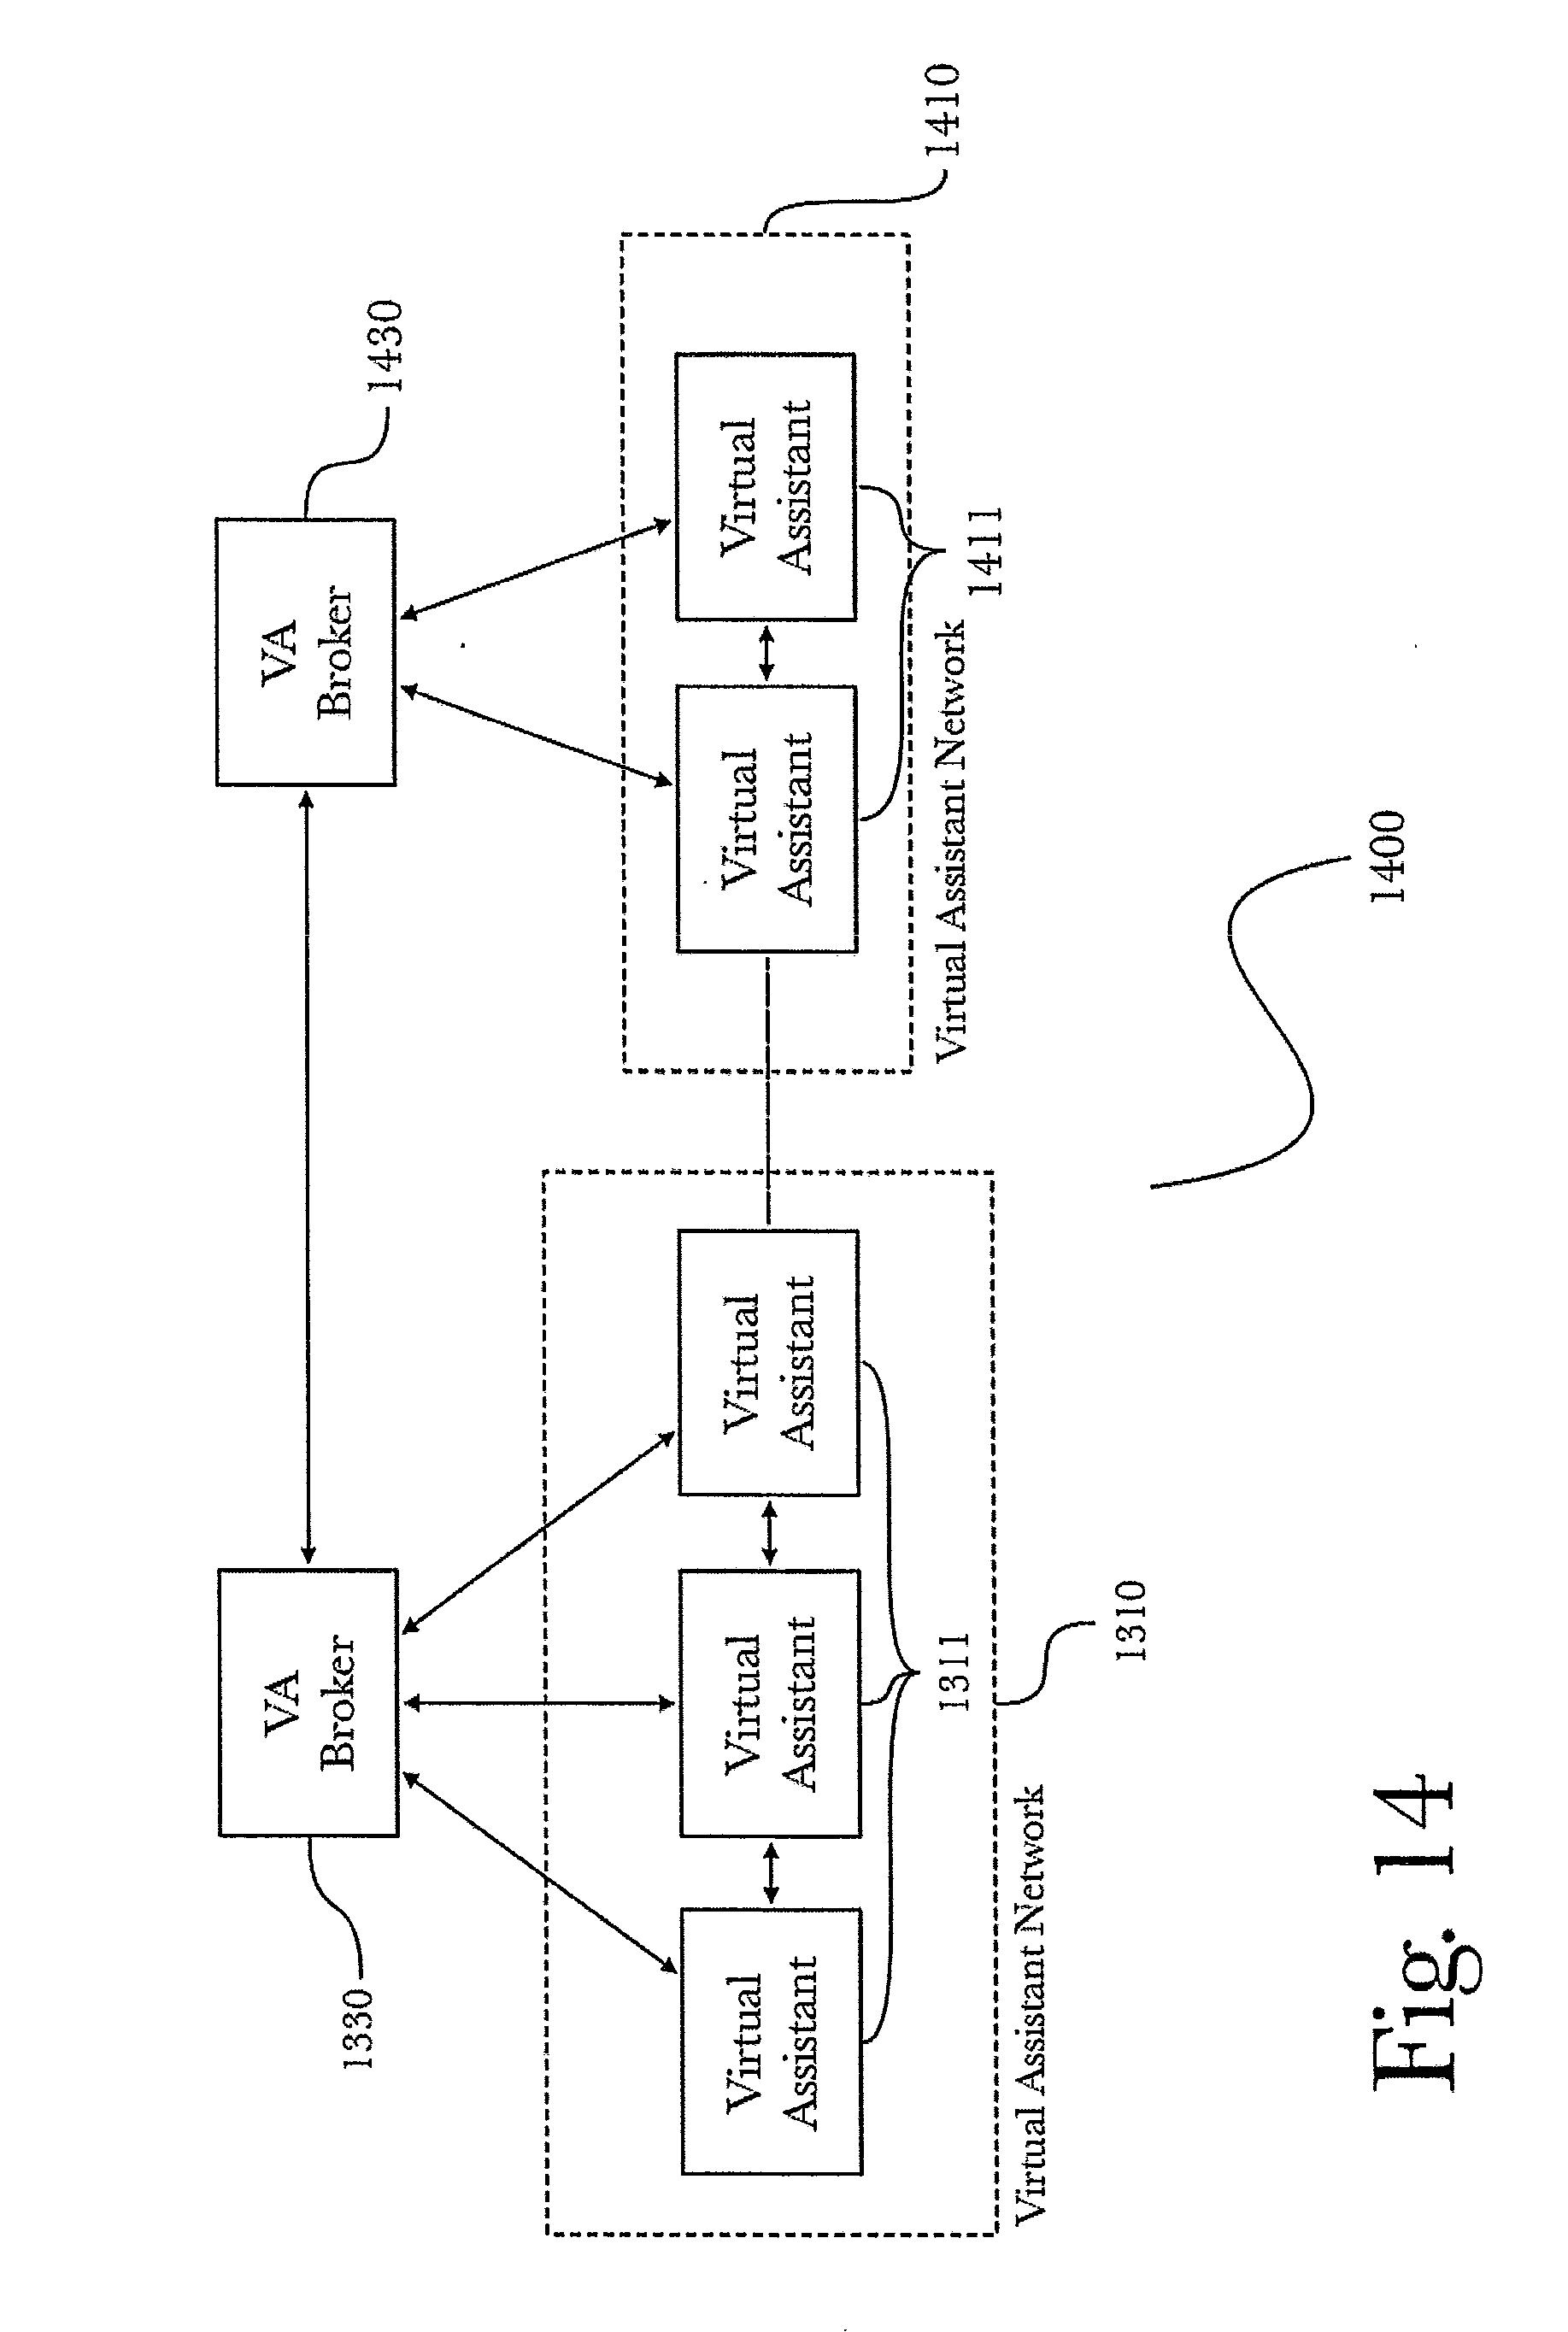 2000 honda cbr 600 f4 wiring diagram honda 5 wire ignition switch, Wiring diagram